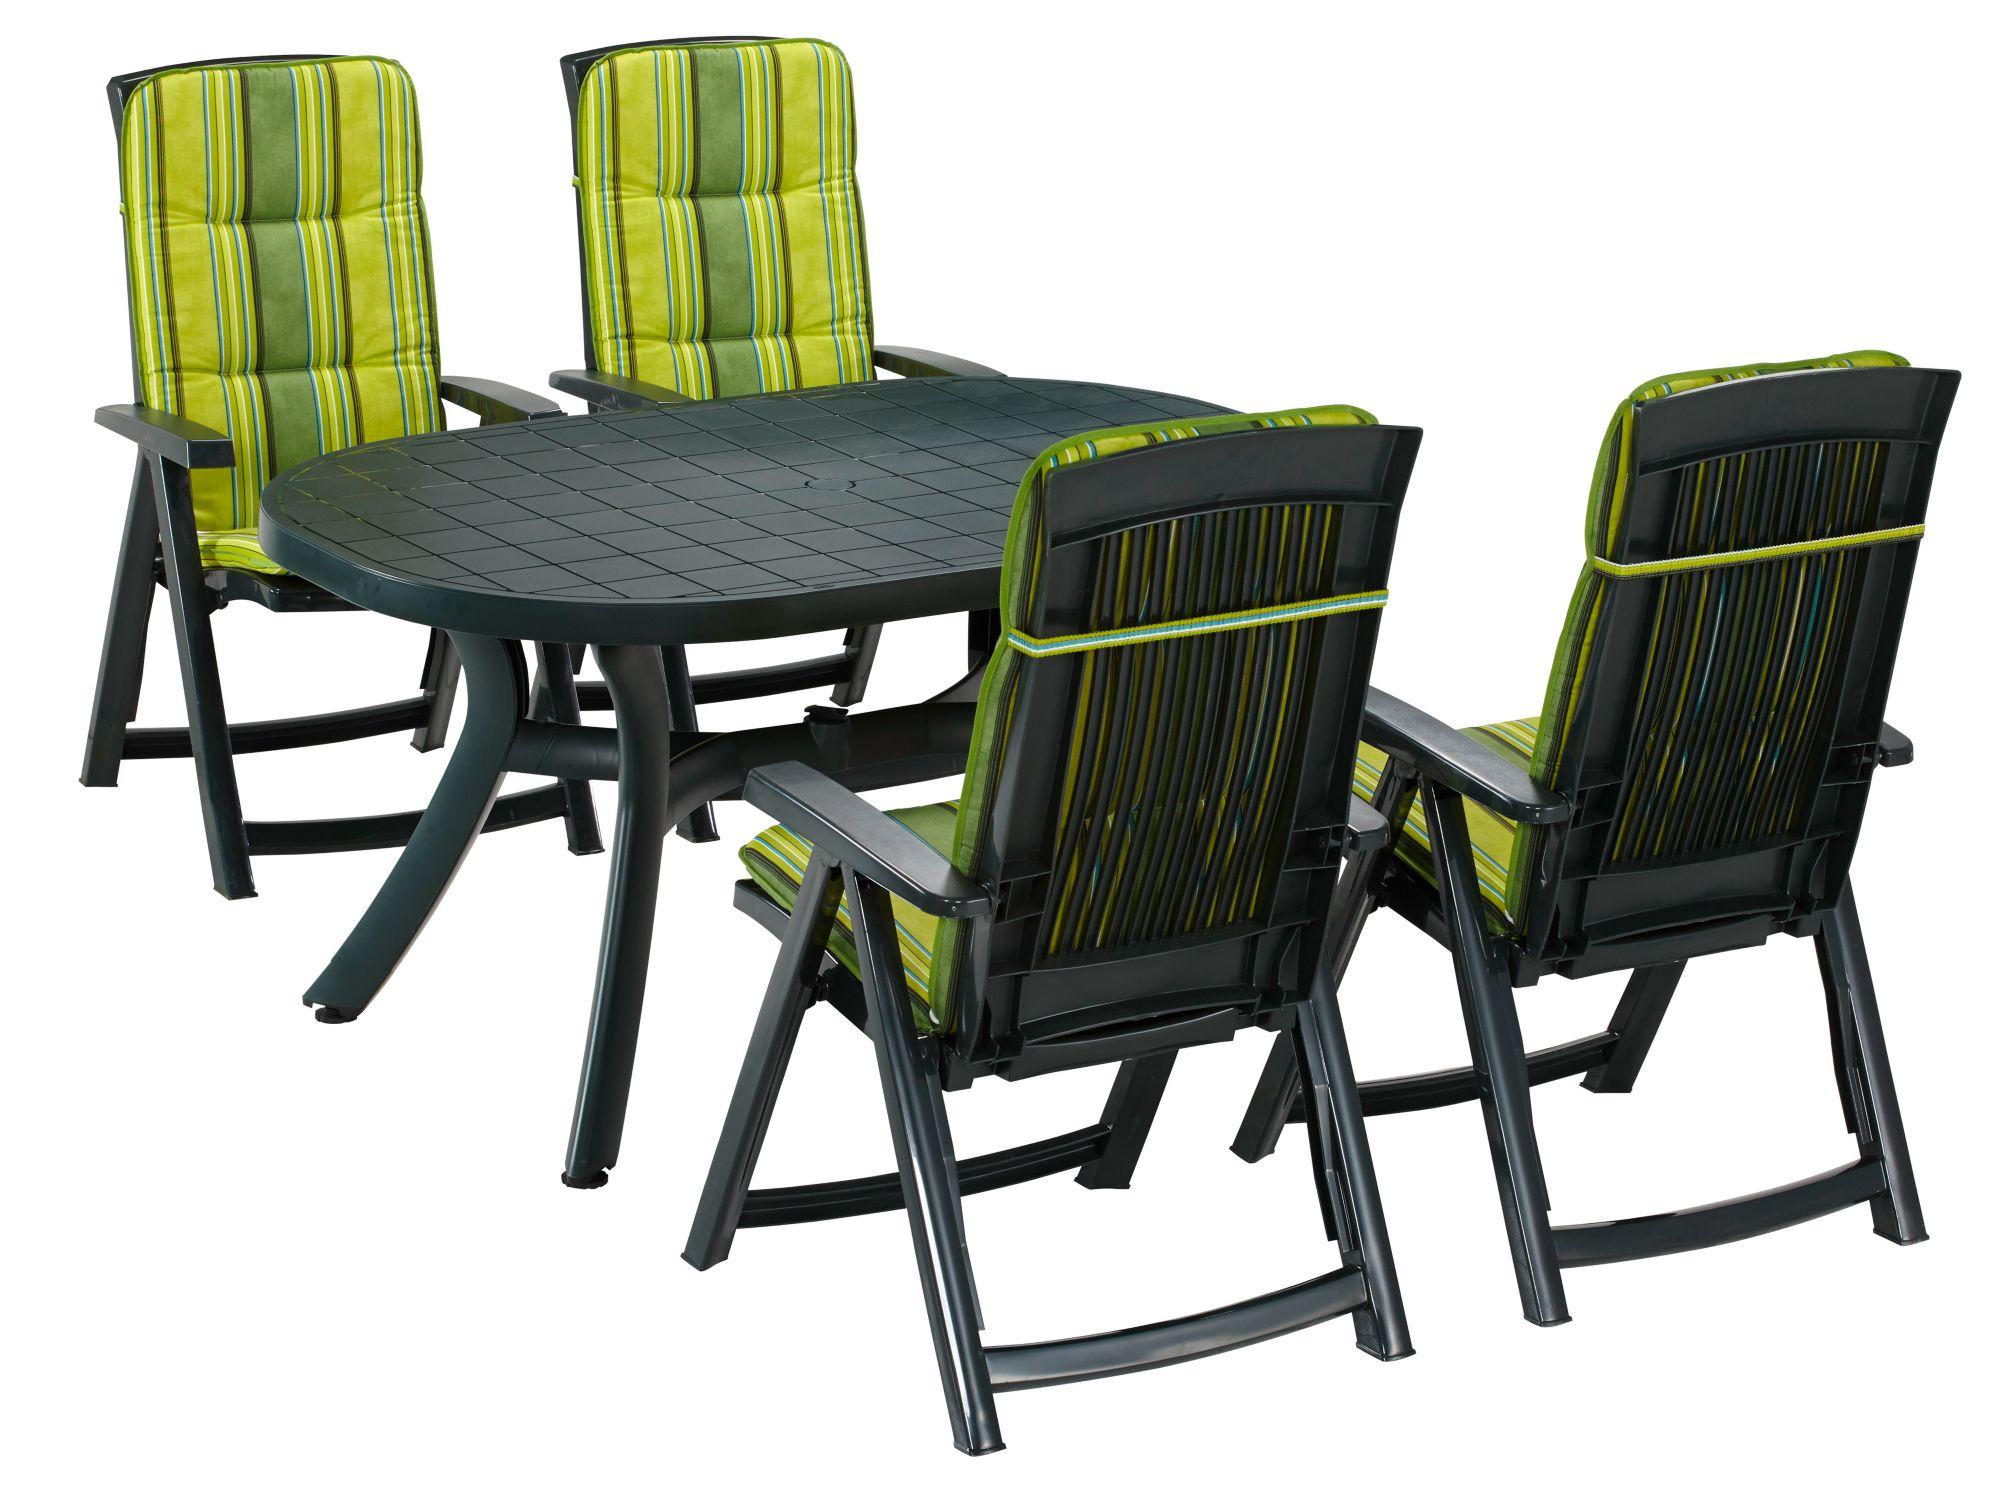 BEST  Gartenmöbelset »Kansas«, 9-tgl., 4 Klappsessel, Tisch 145x95 cm, Kunststoff, grün